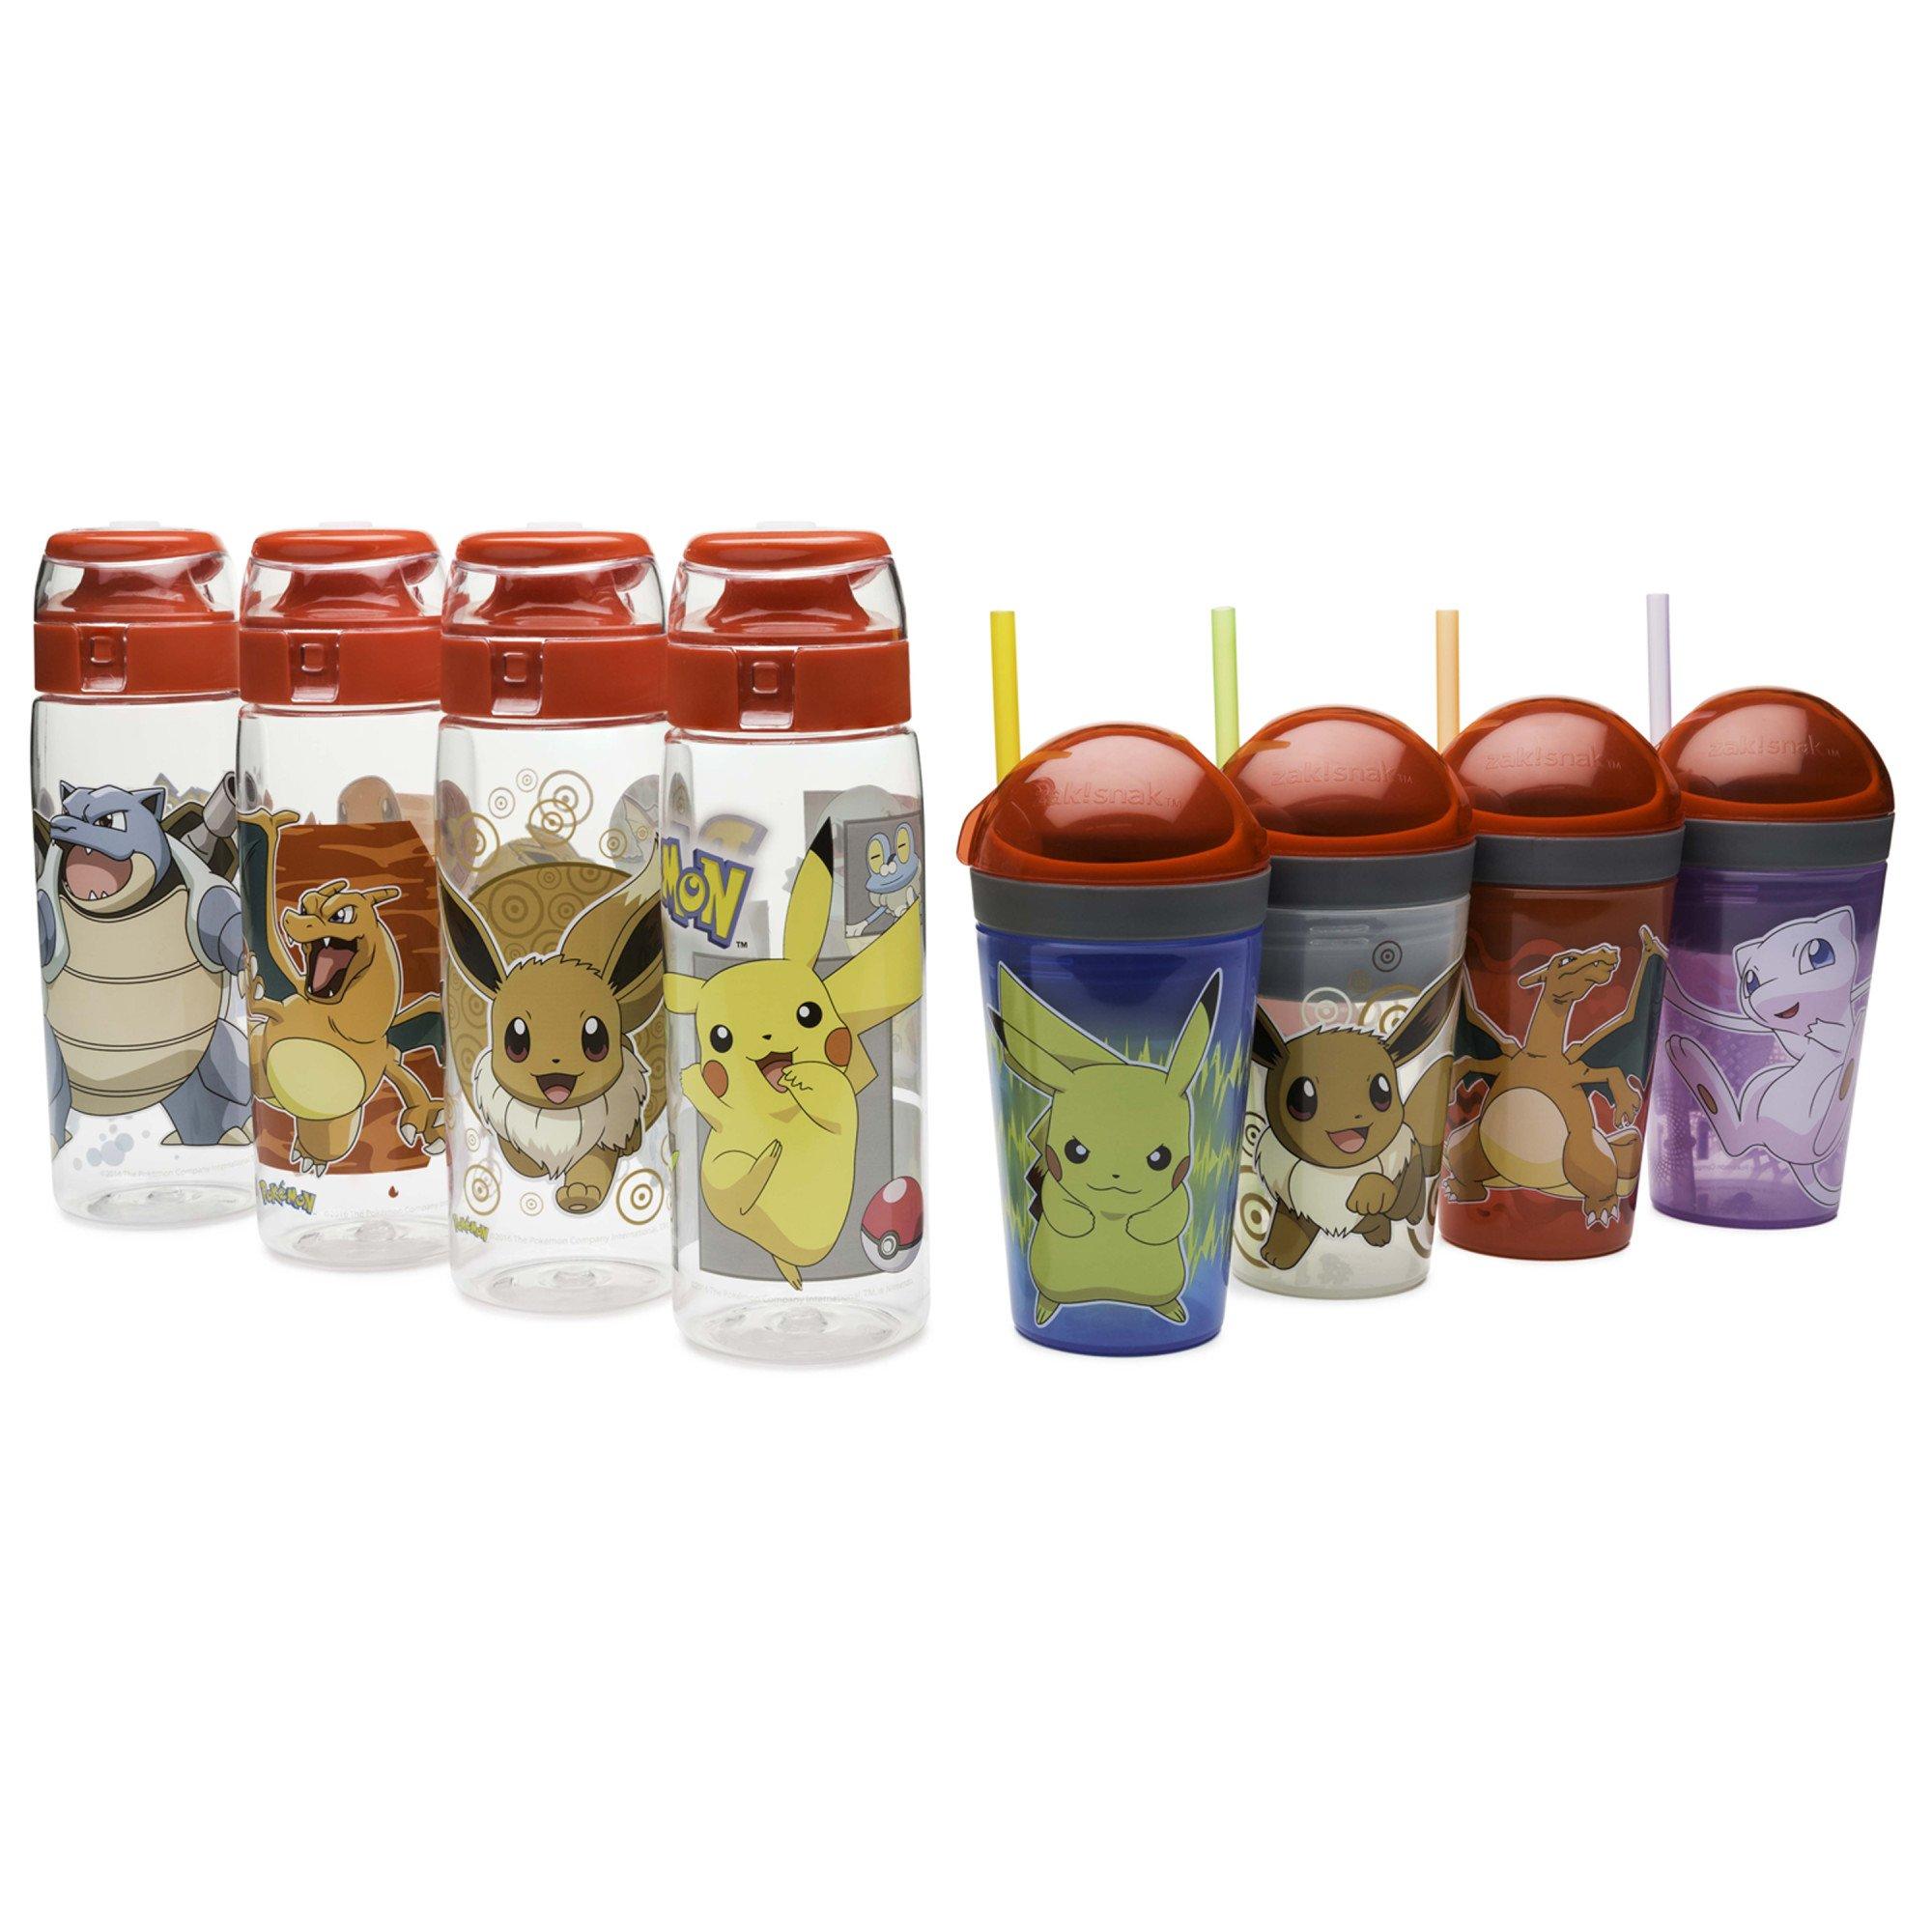 Pokemon POKC-K952 Pikachu Water Bottles 25 oz. by Zak Designs by Pokémon (Image #7)